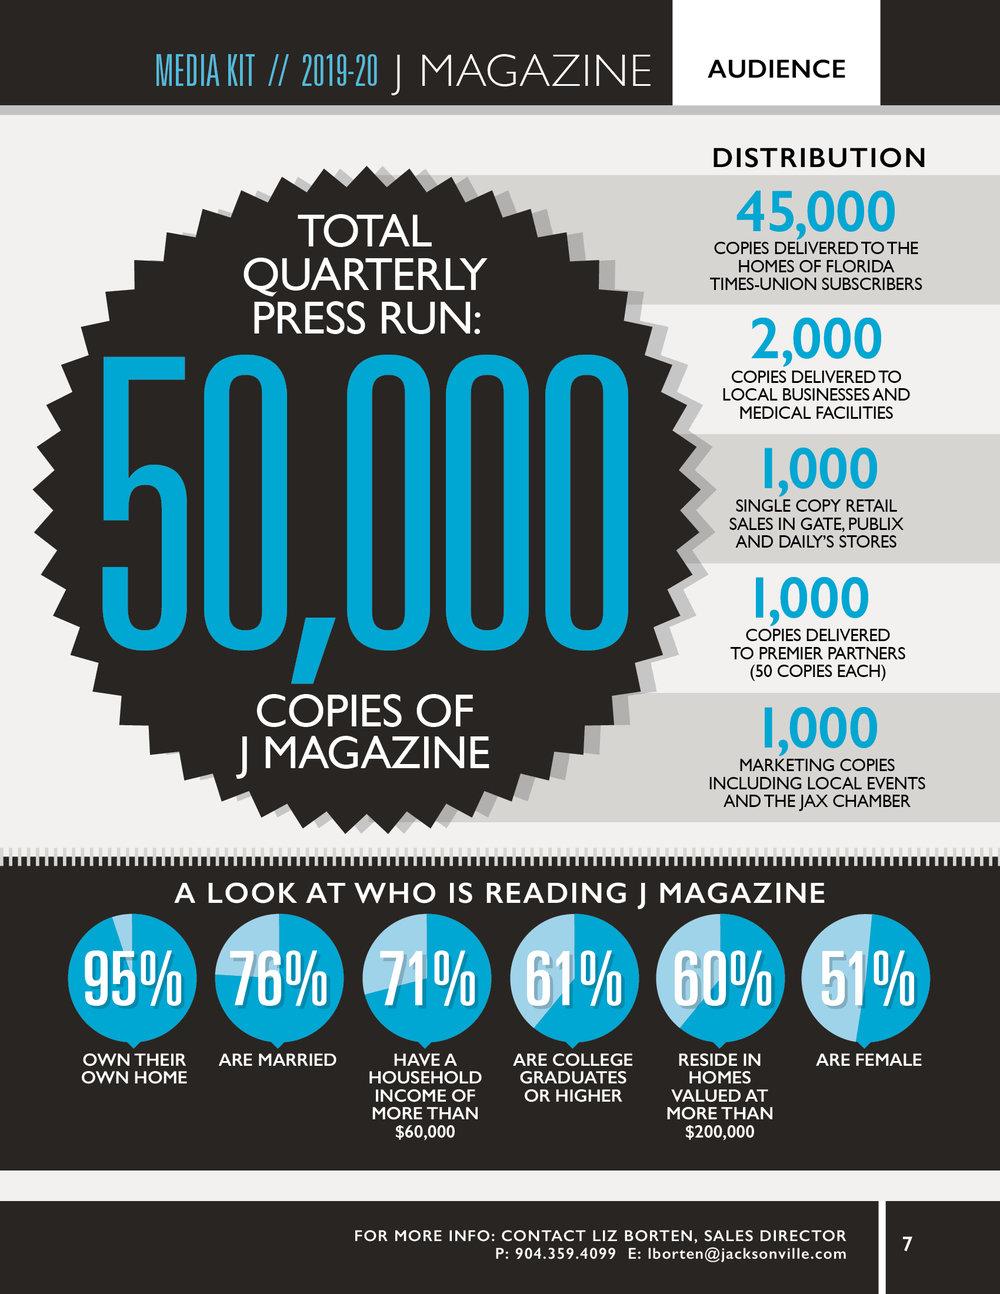 J Mag Media Kit..v2SM7.jpg